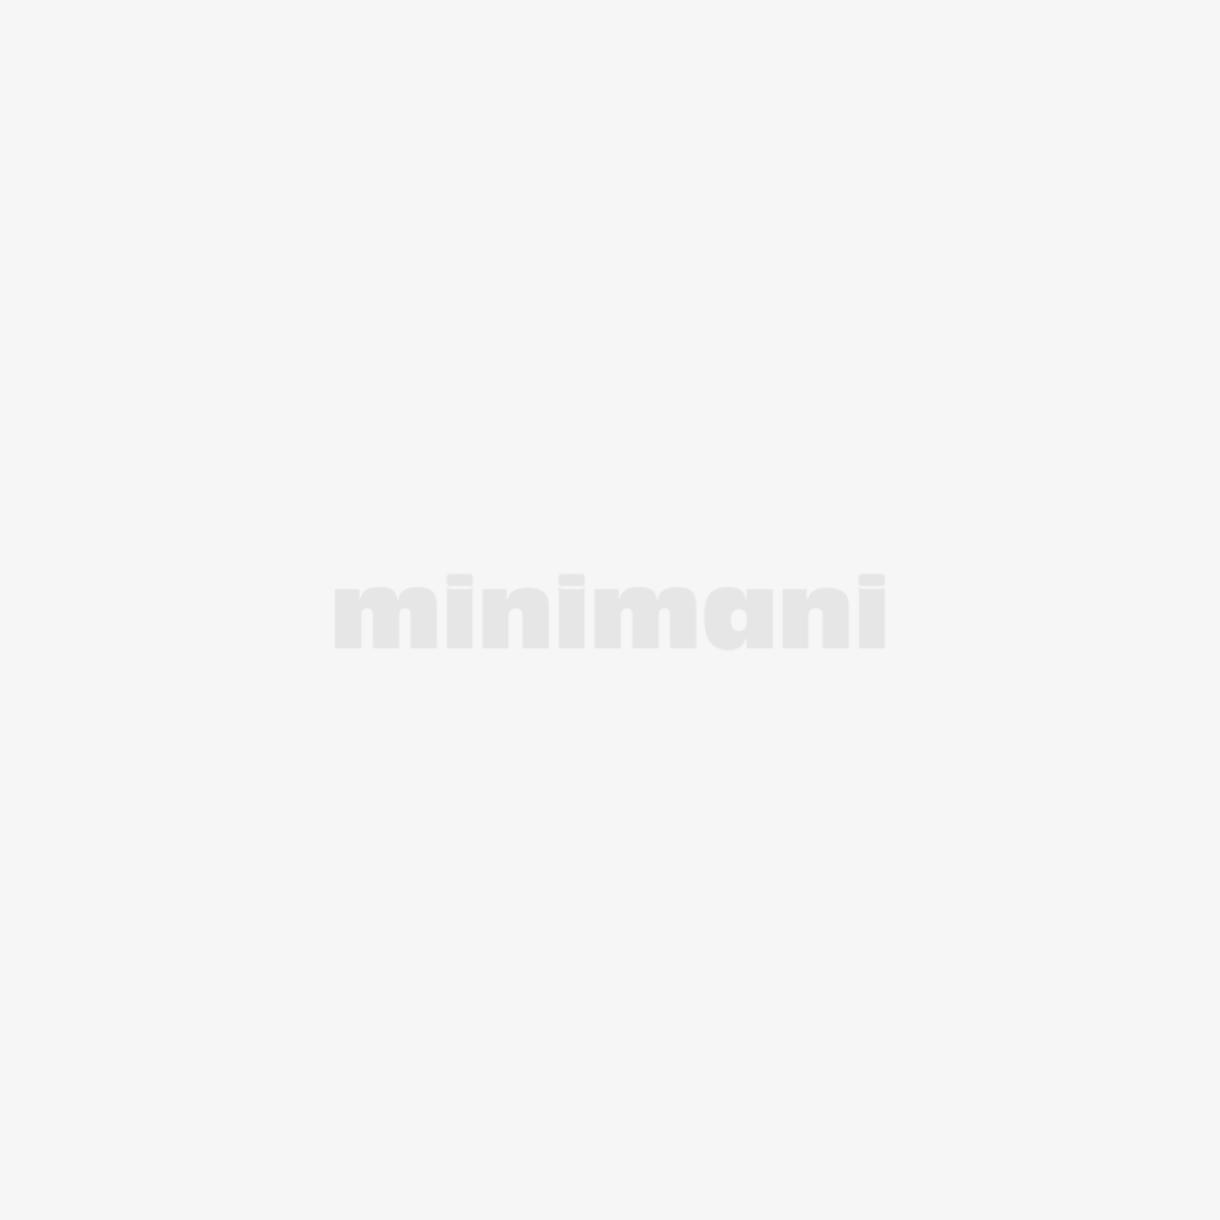 FINNWEAR NAISTEN PITKIKSET, BAMBU S 1210 SORT